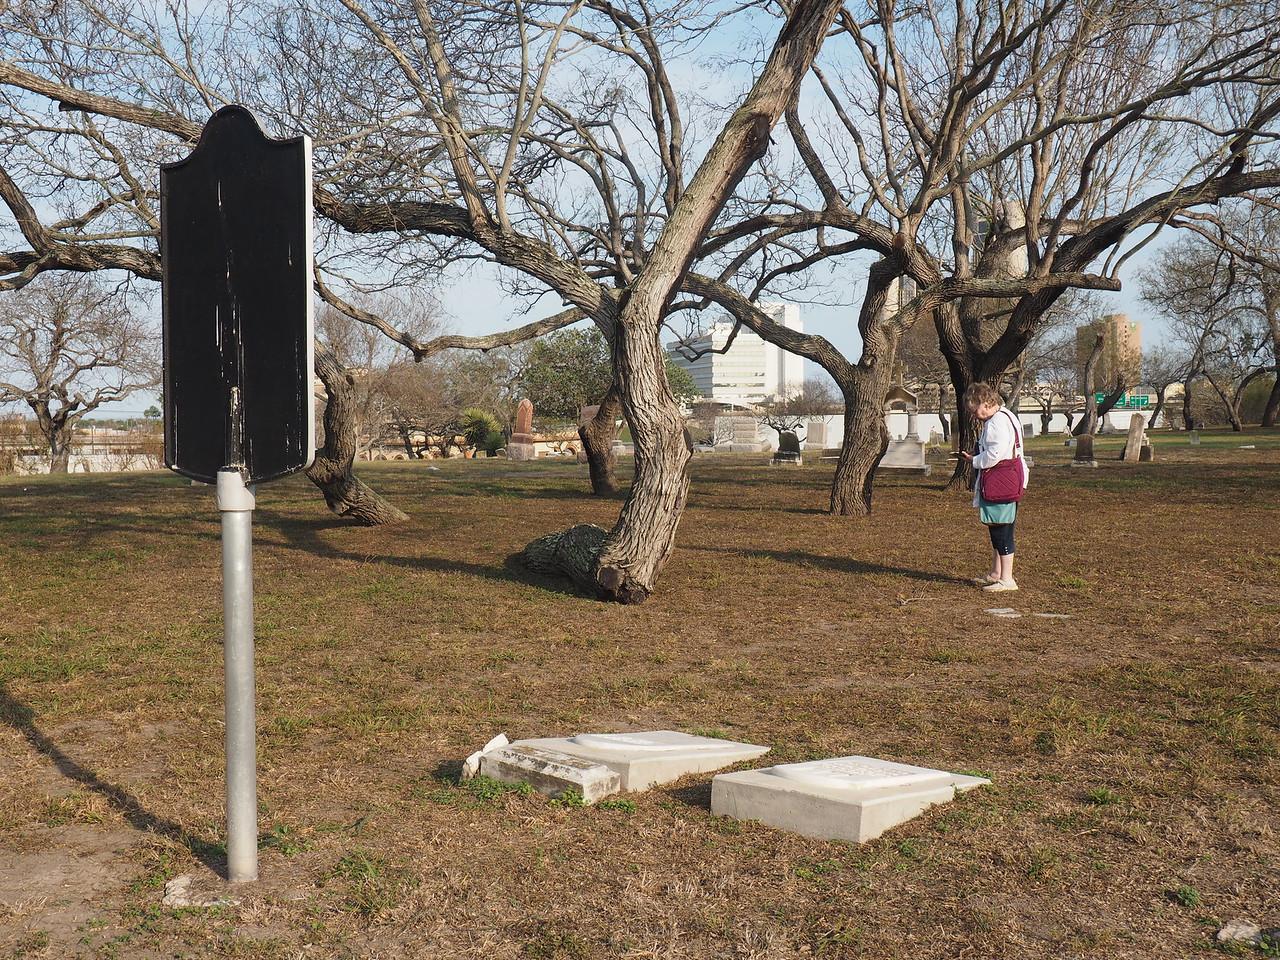 Back side of John Dix historic marker with John and Mary Dix gravestones